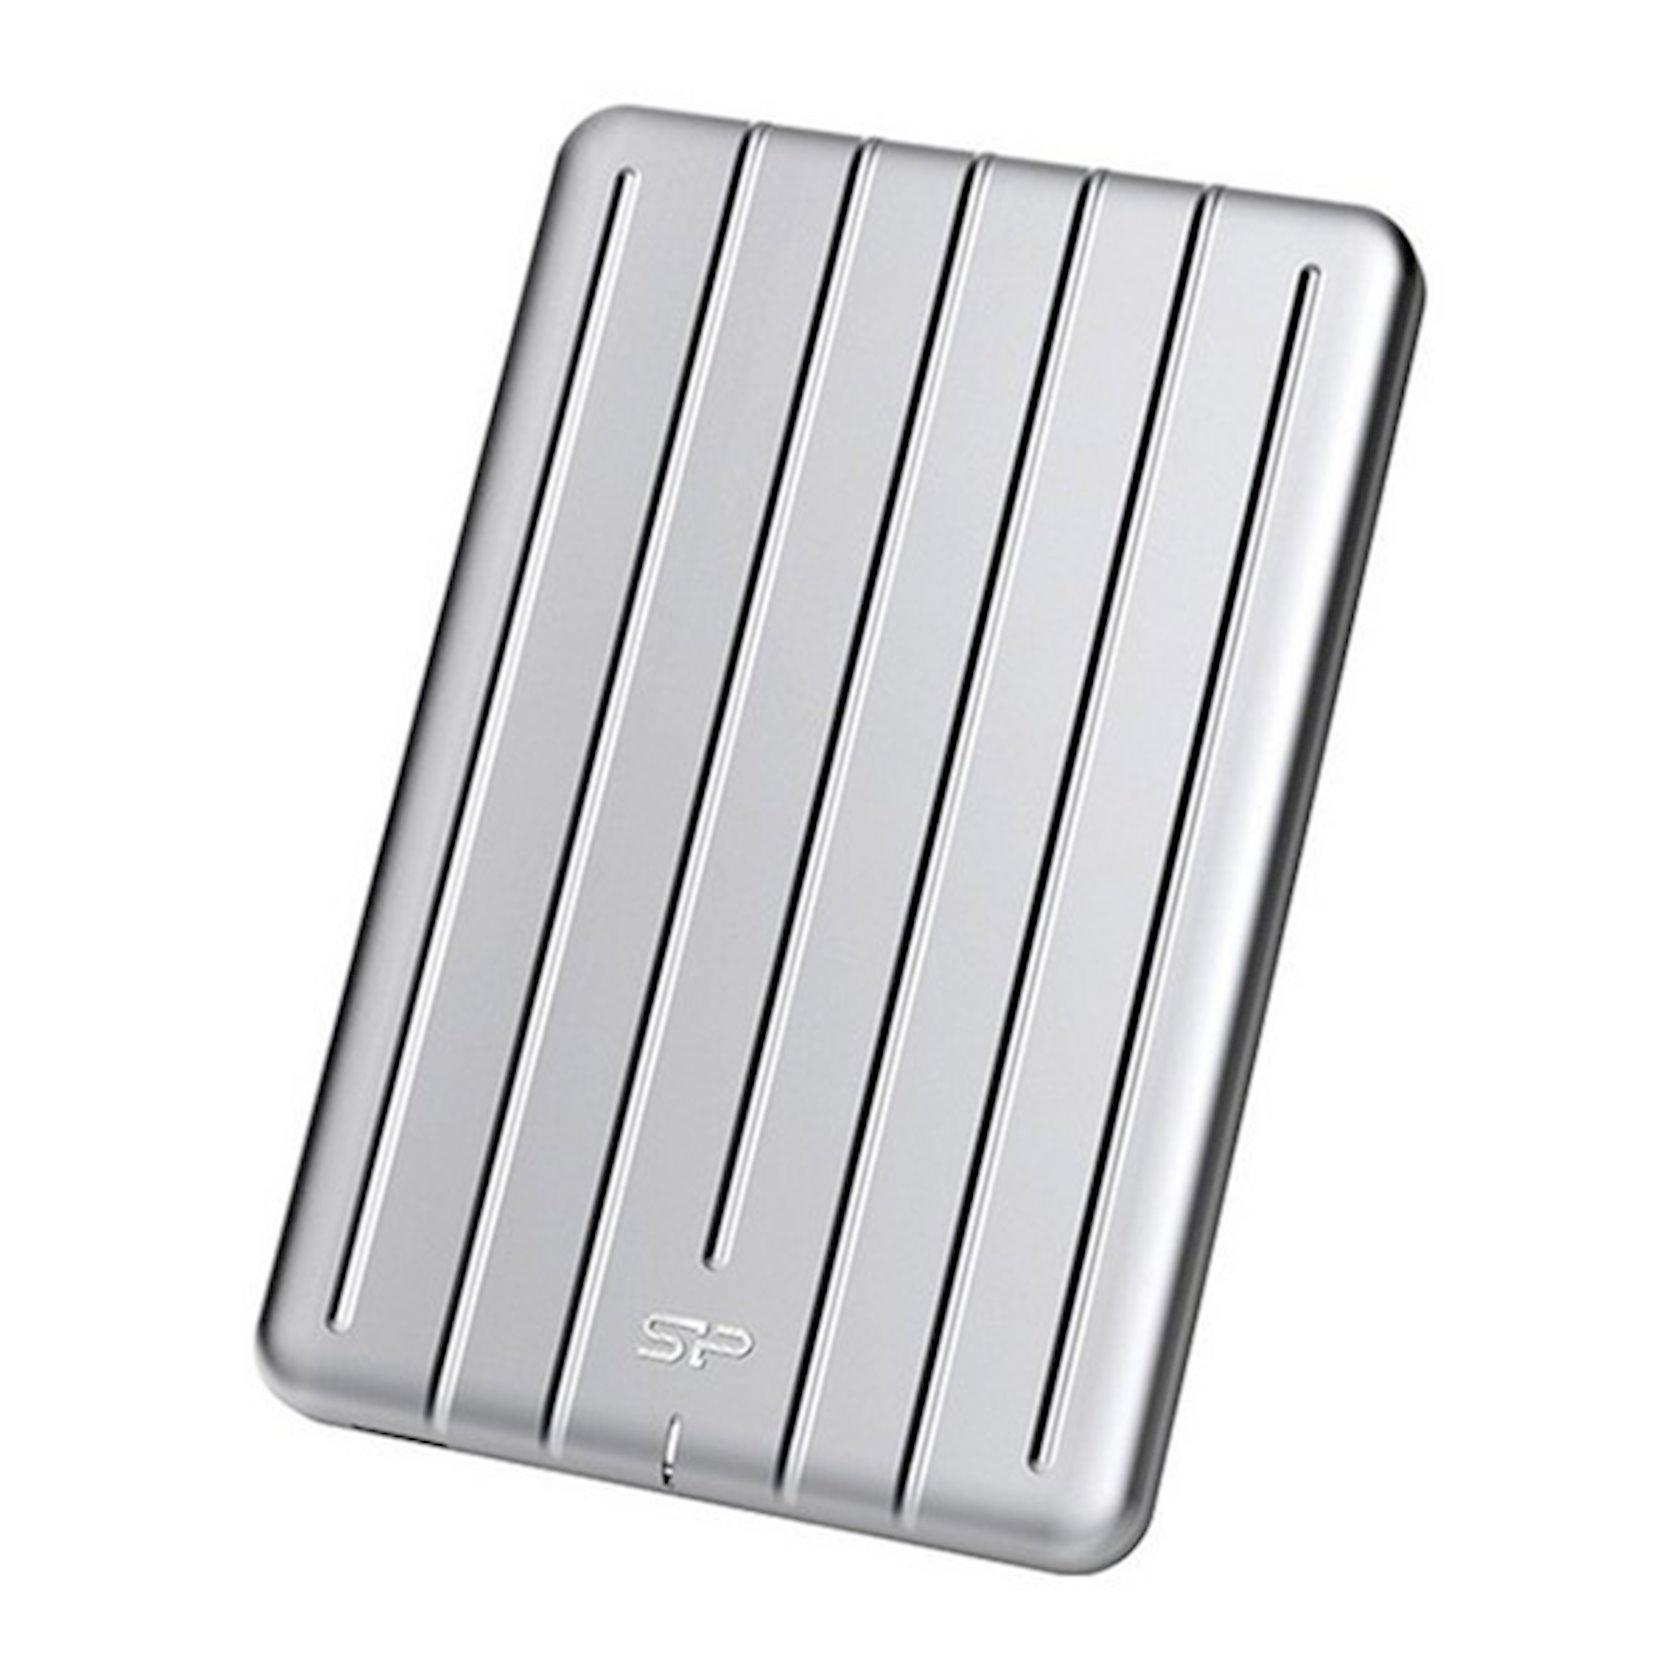 Xarici sərt disk Silicon Power SSD Bolt B75 Pro 512 GB